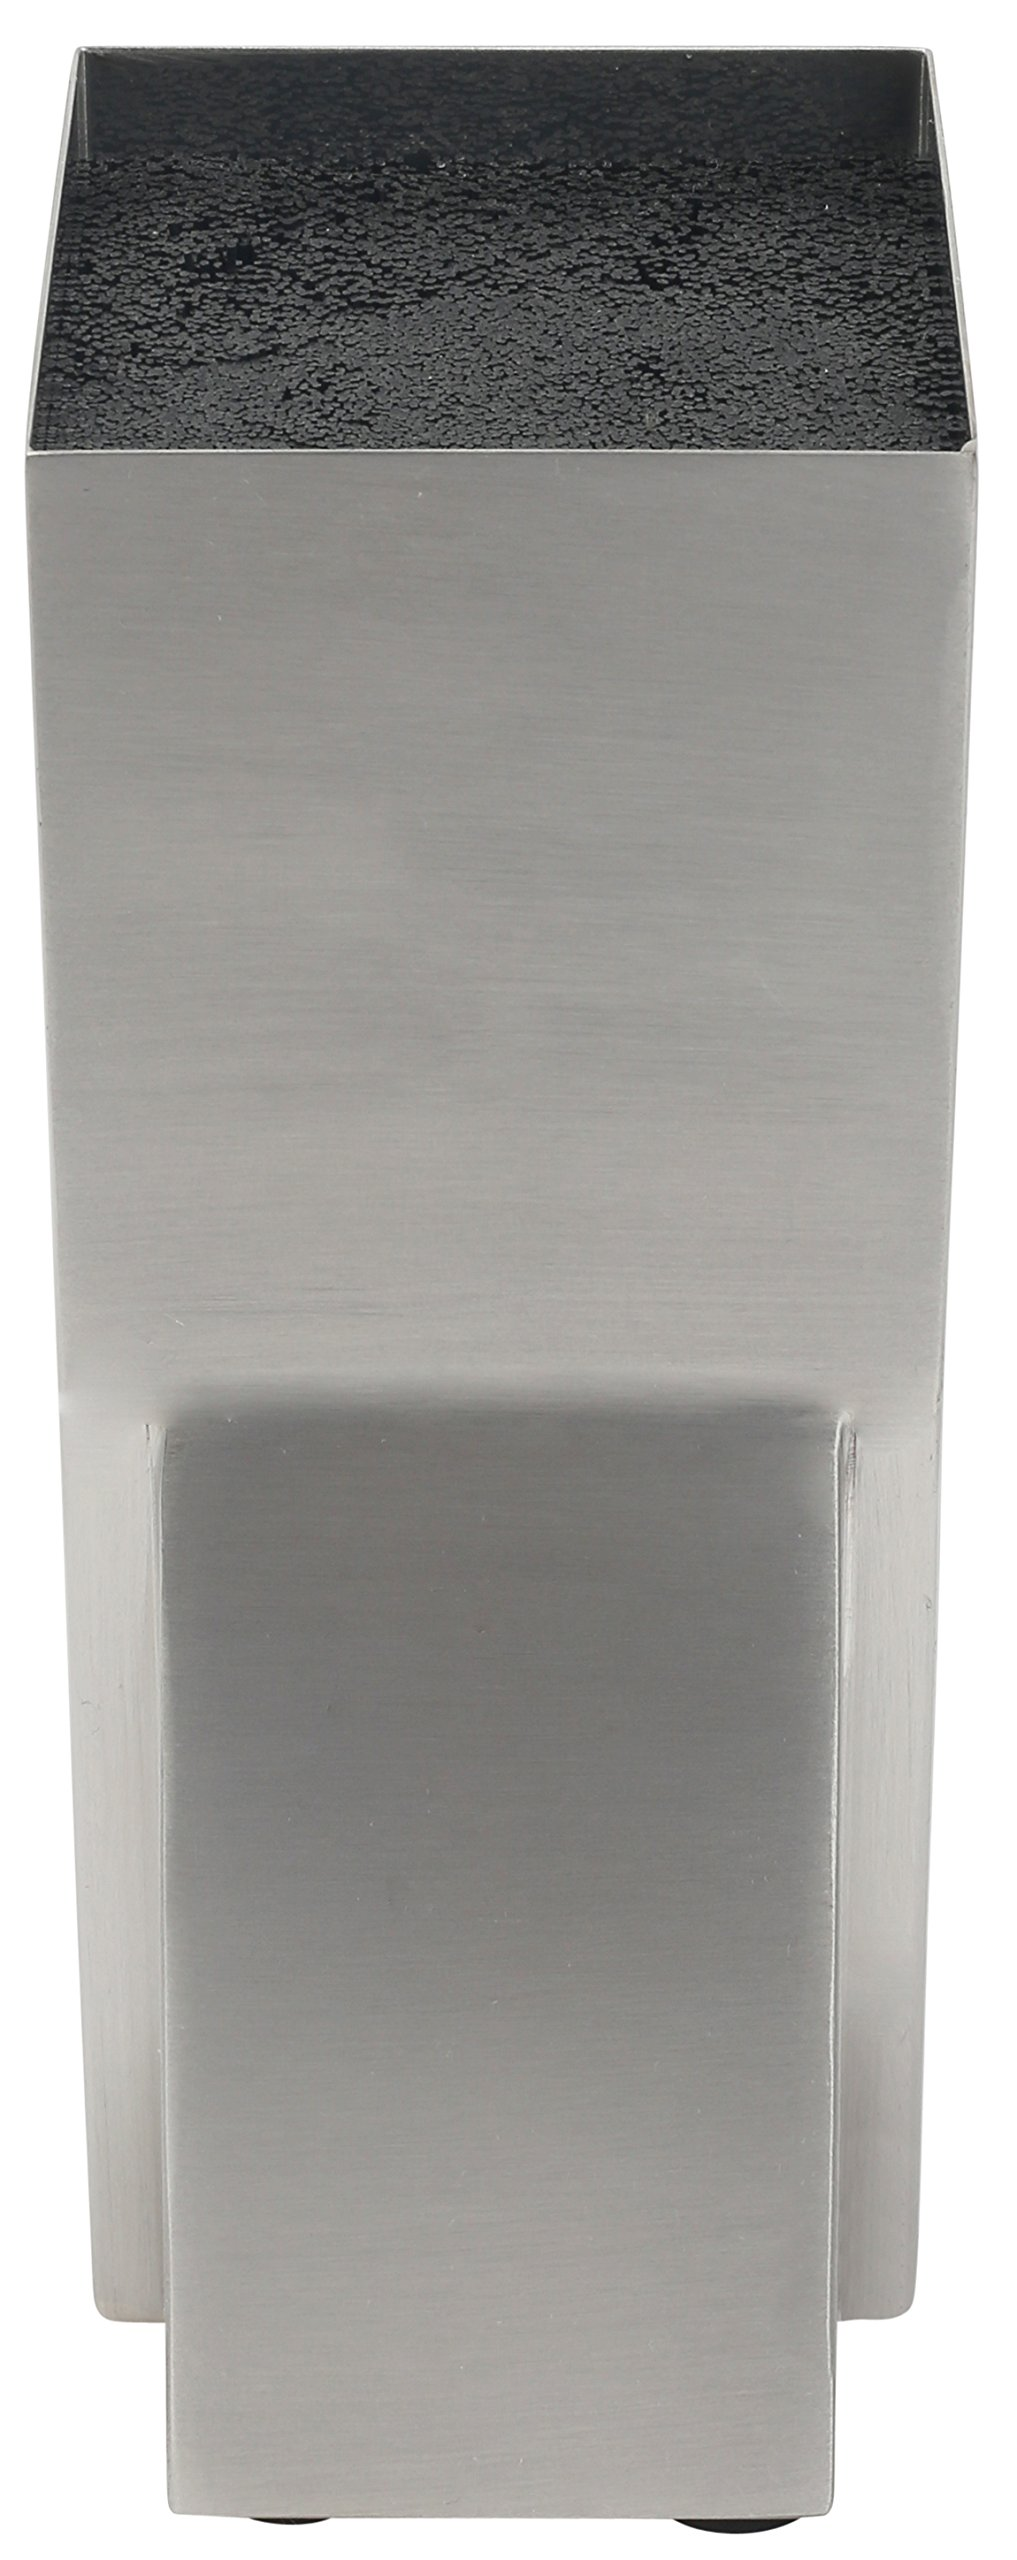 Mantello Universal Stainless Steel Knife Block Knife Holder Storage Organizer by Mantello (Image #2)